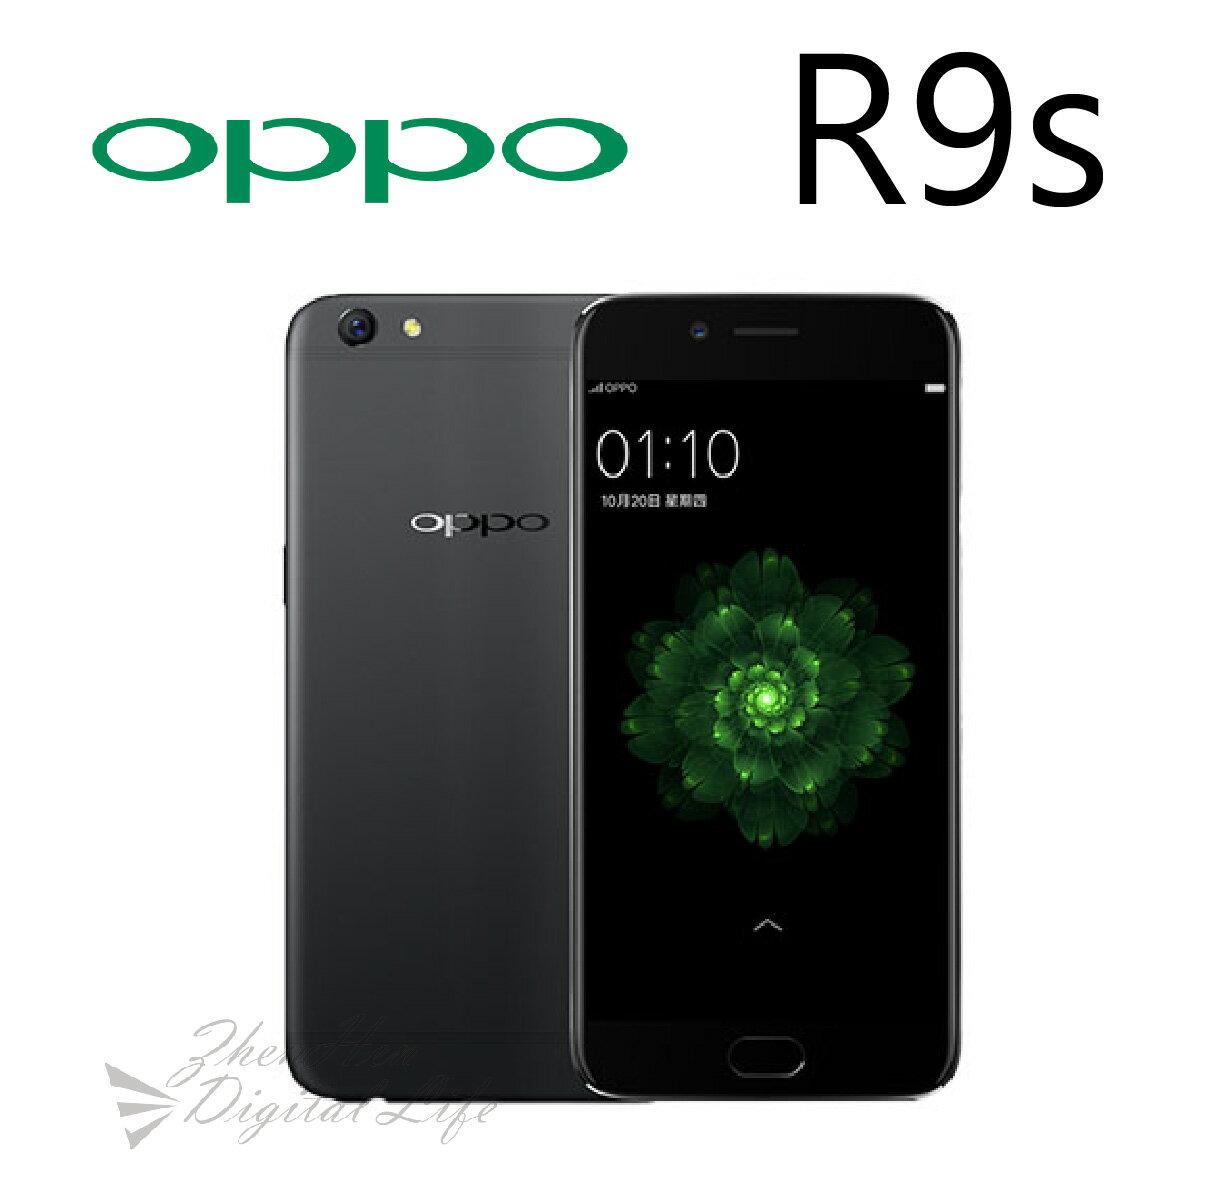 OPPO R9s 雙卡雙待/VOOC 閃充技術 4GB/64GB-黑 《贈原廠閃充車充+玻璃保護貼》